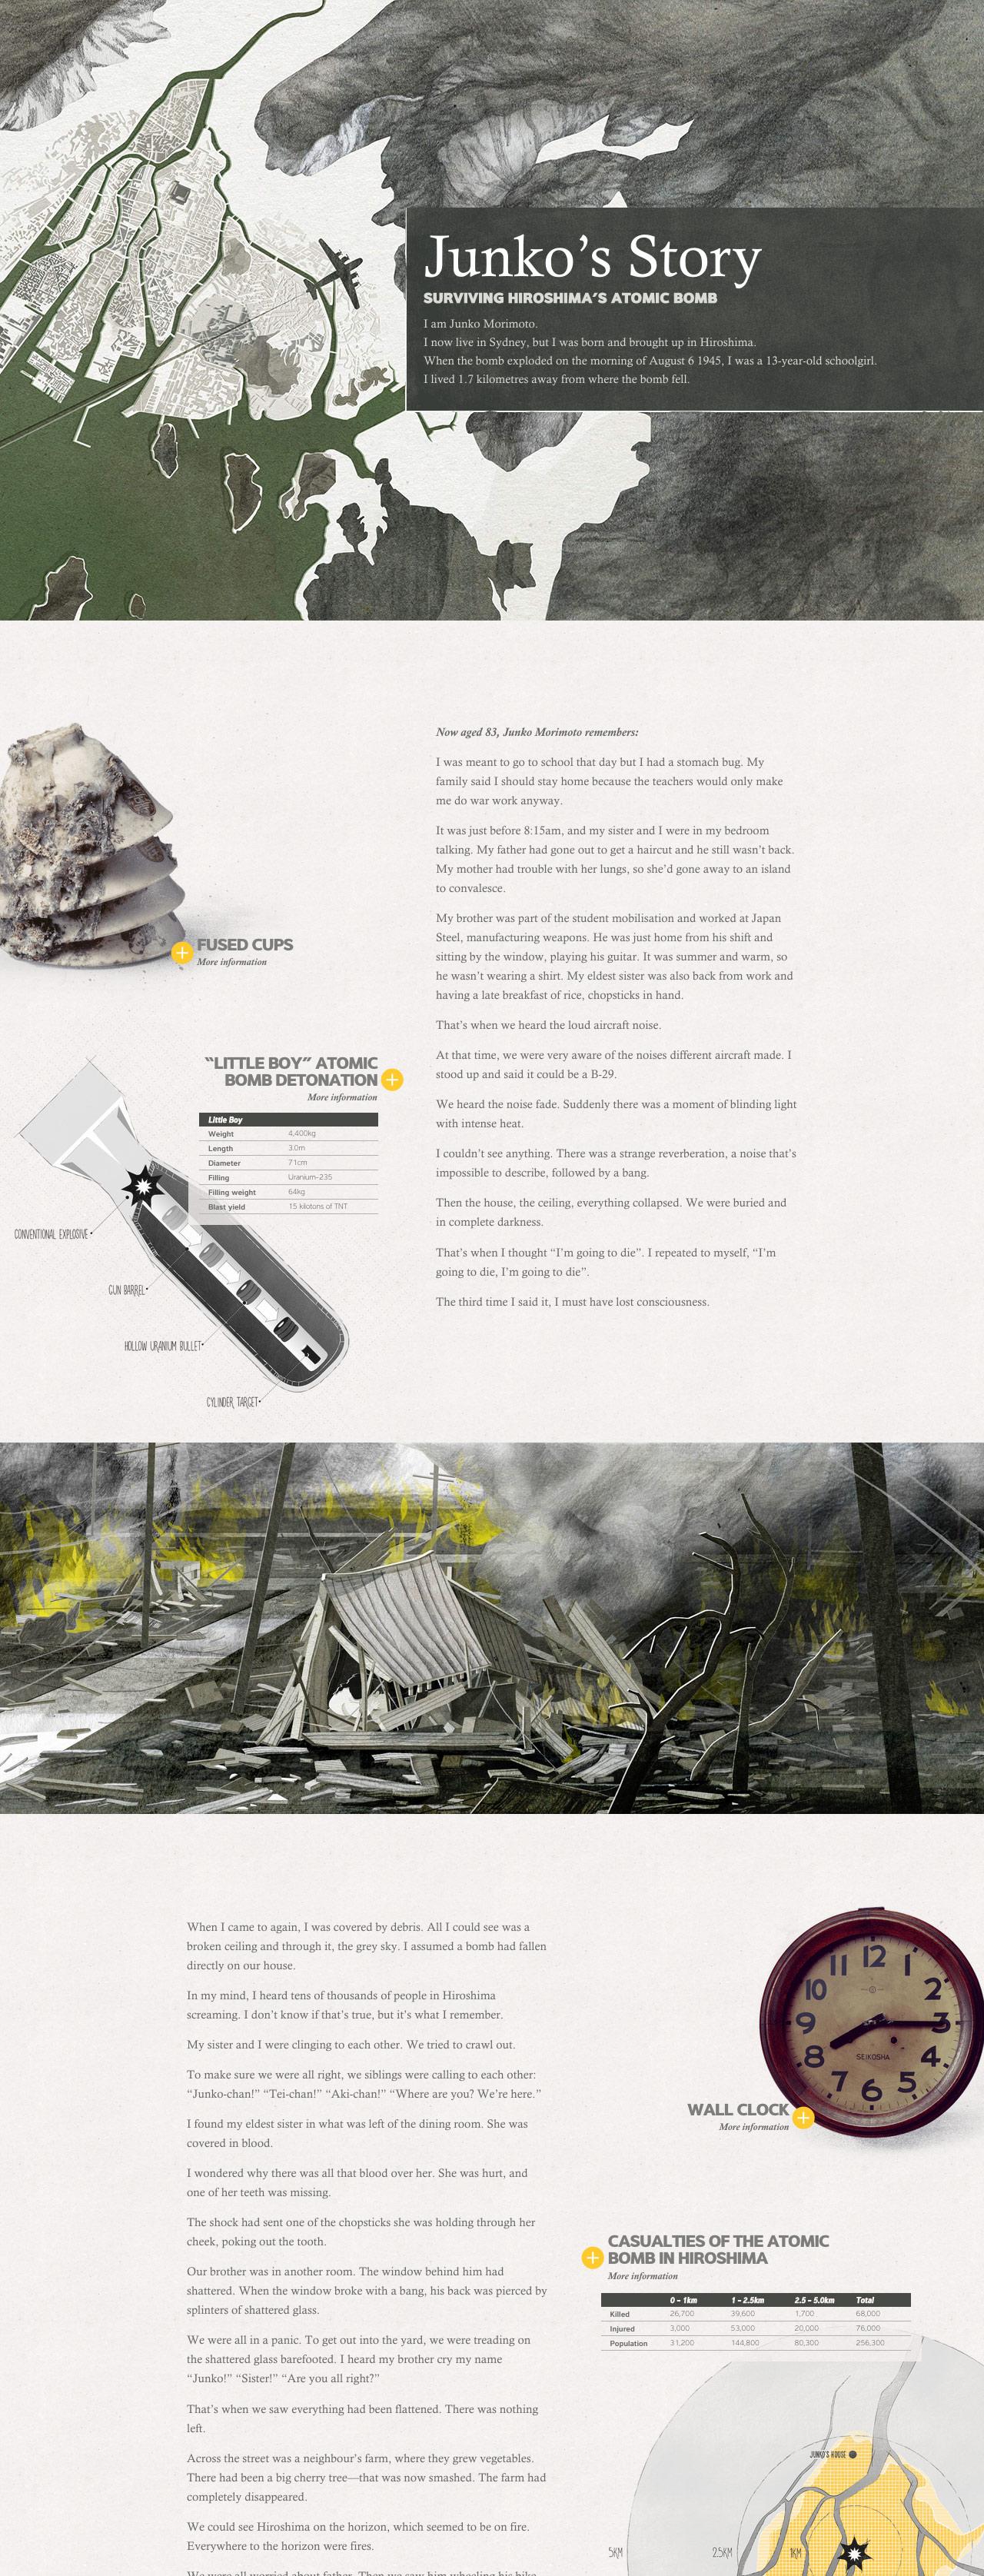 Junko's Story: Surviving Hiroshima's Atomic Bomb Website Screenshot